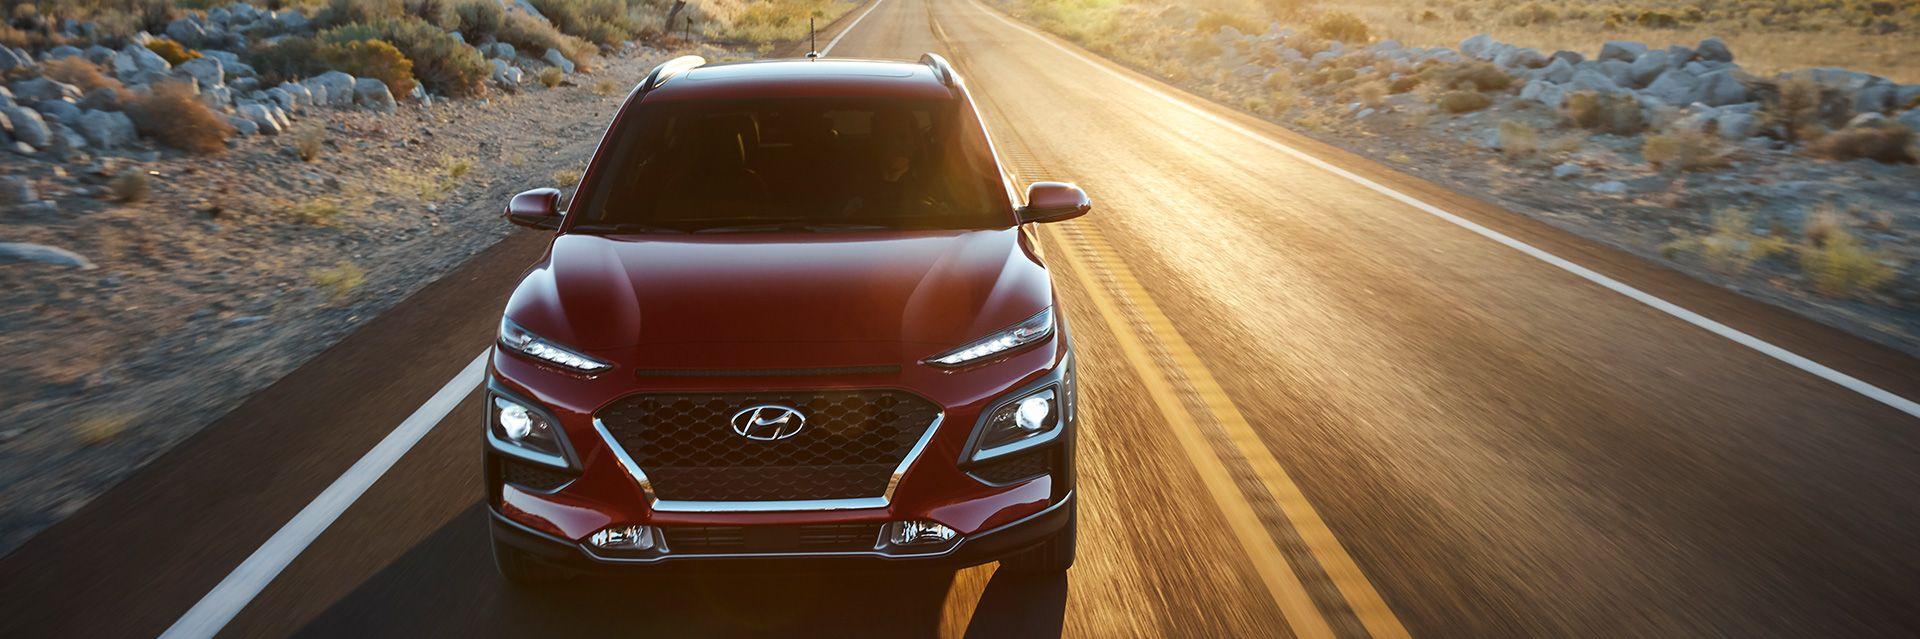 2018 Hyundai Kona for Lease near Alexandria, VA